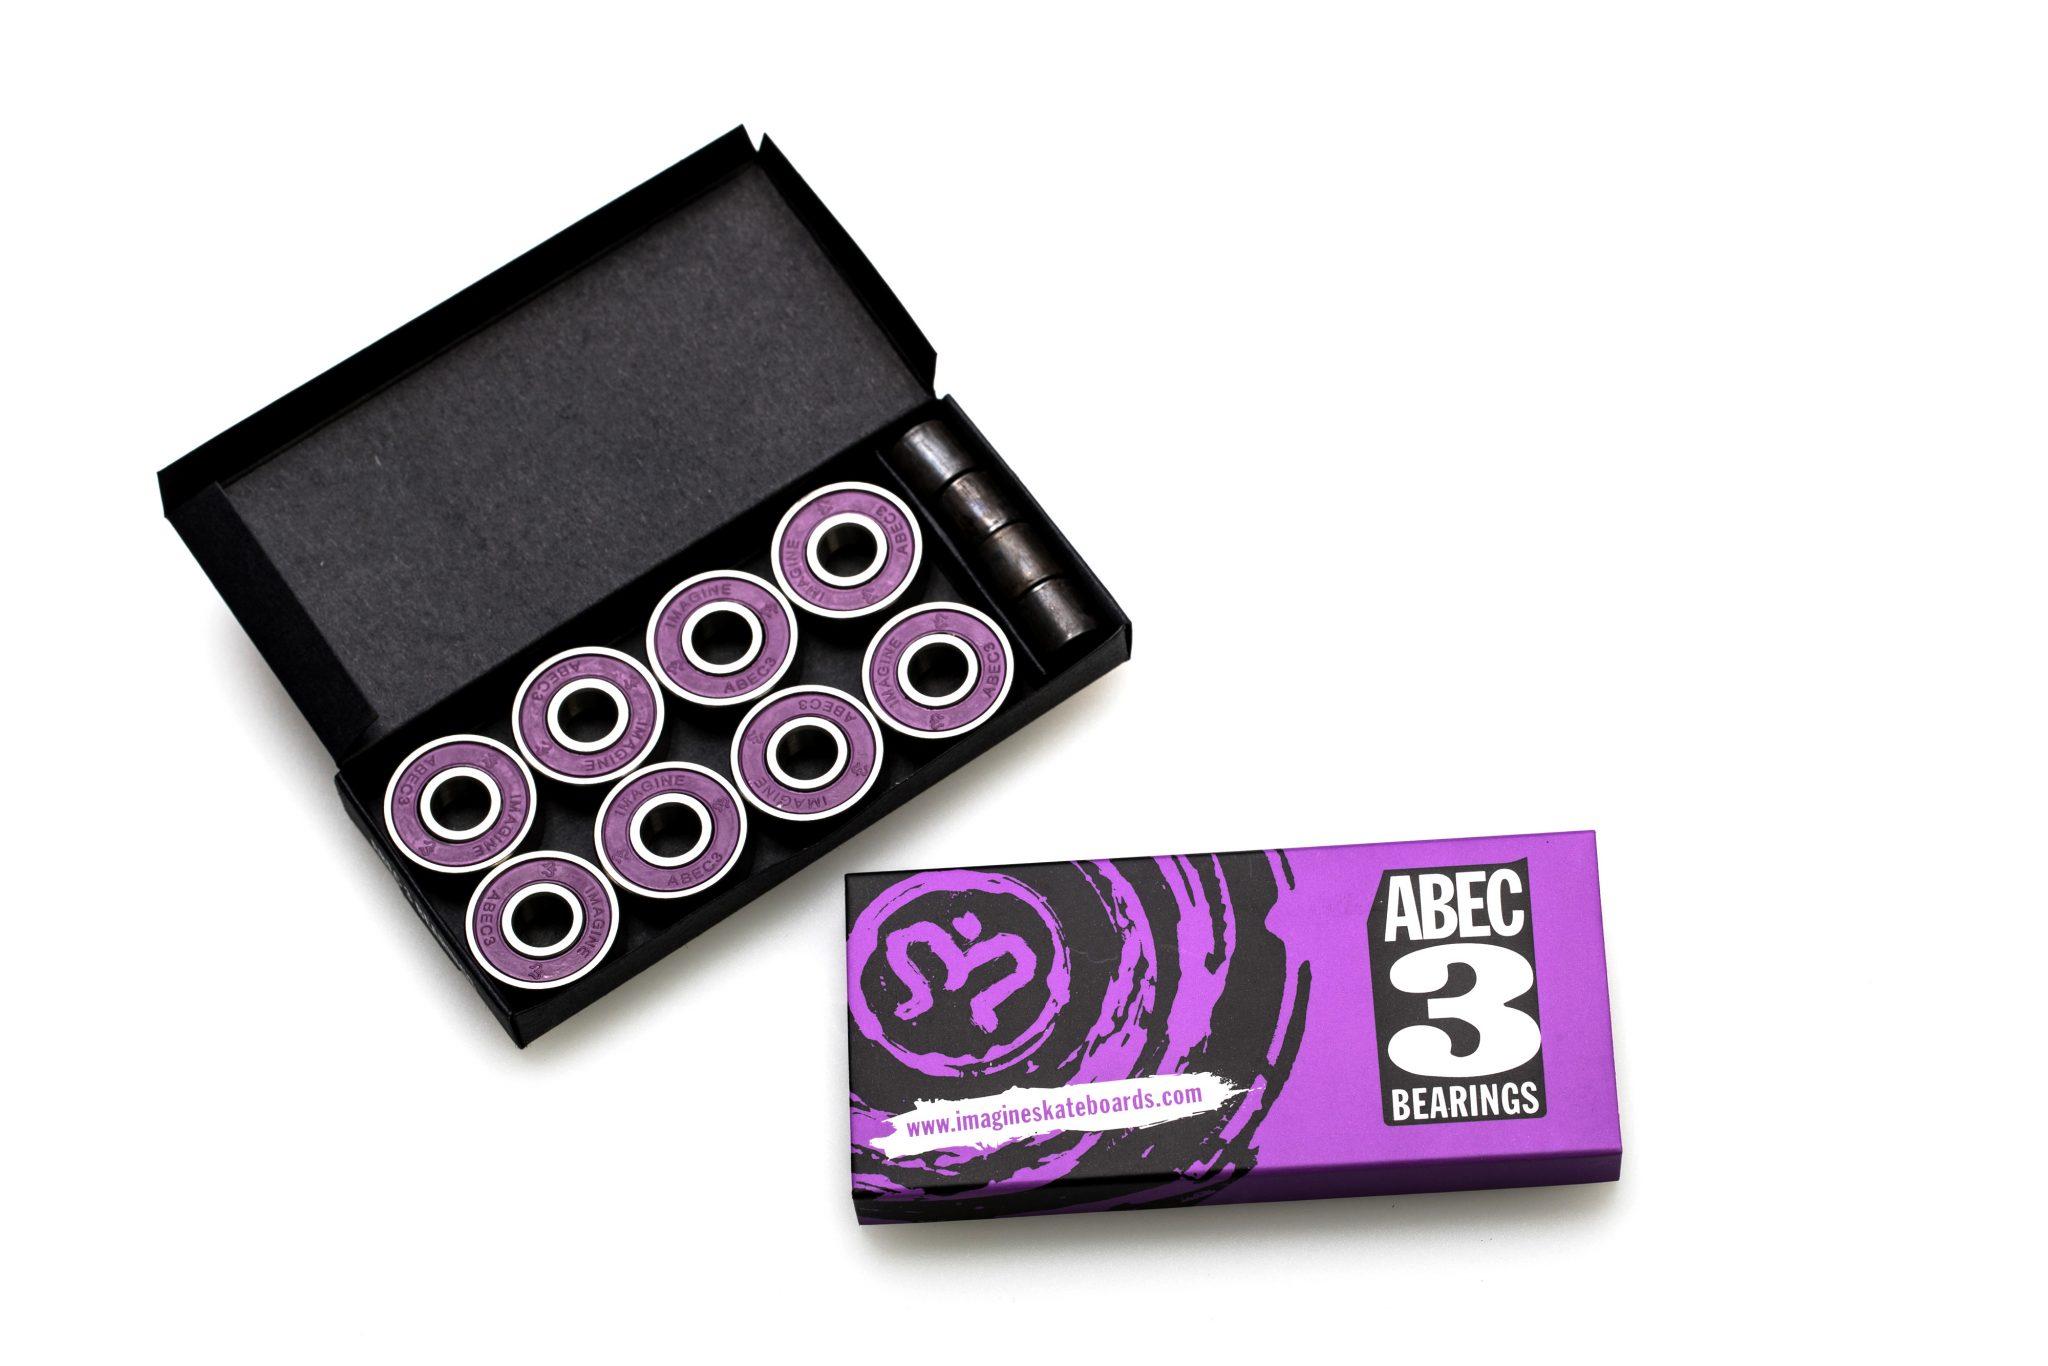 ABEC 3 Bearings - Imagine Skateboards